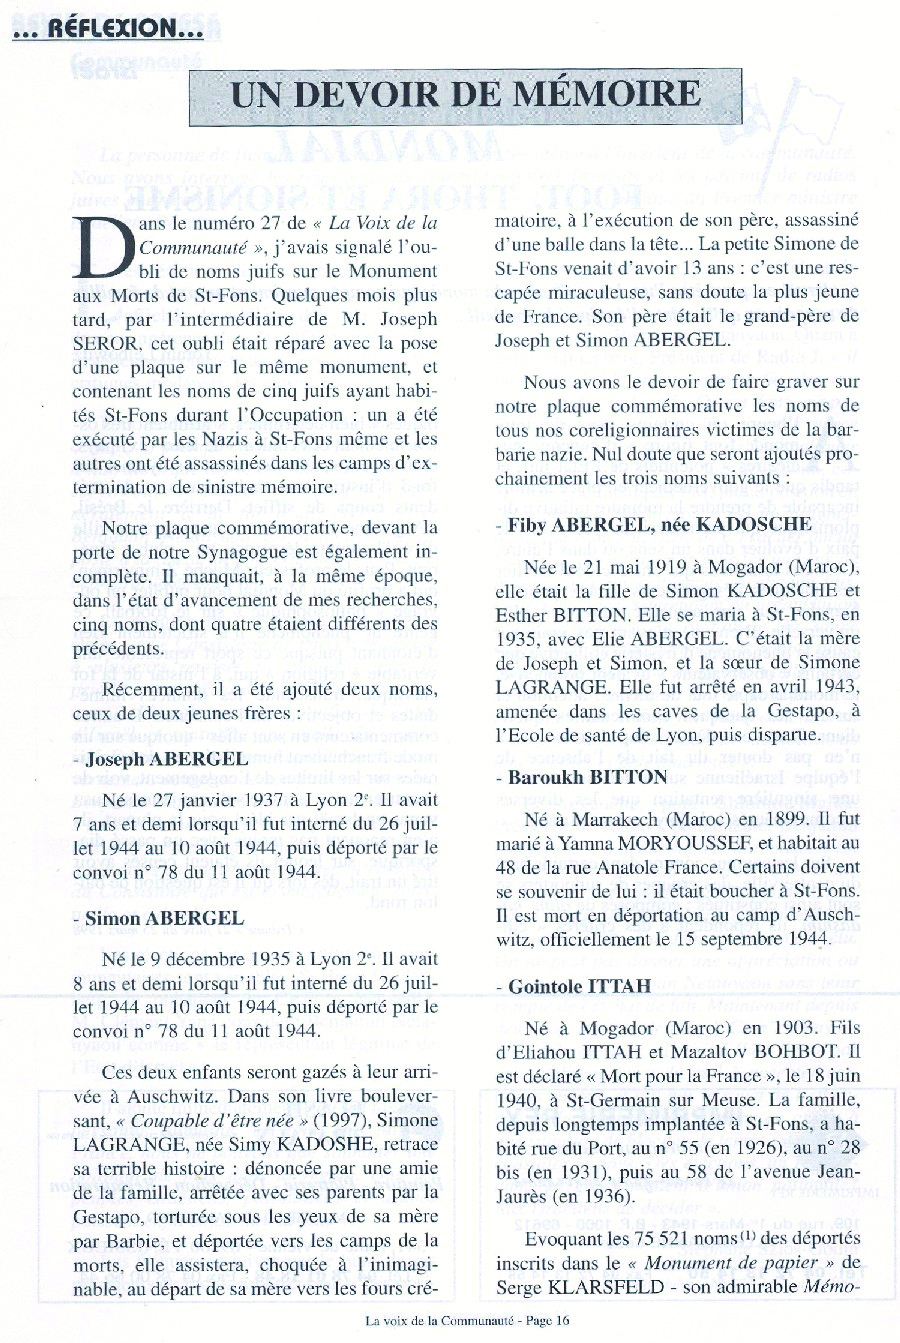 Abergel / Saint-Fons